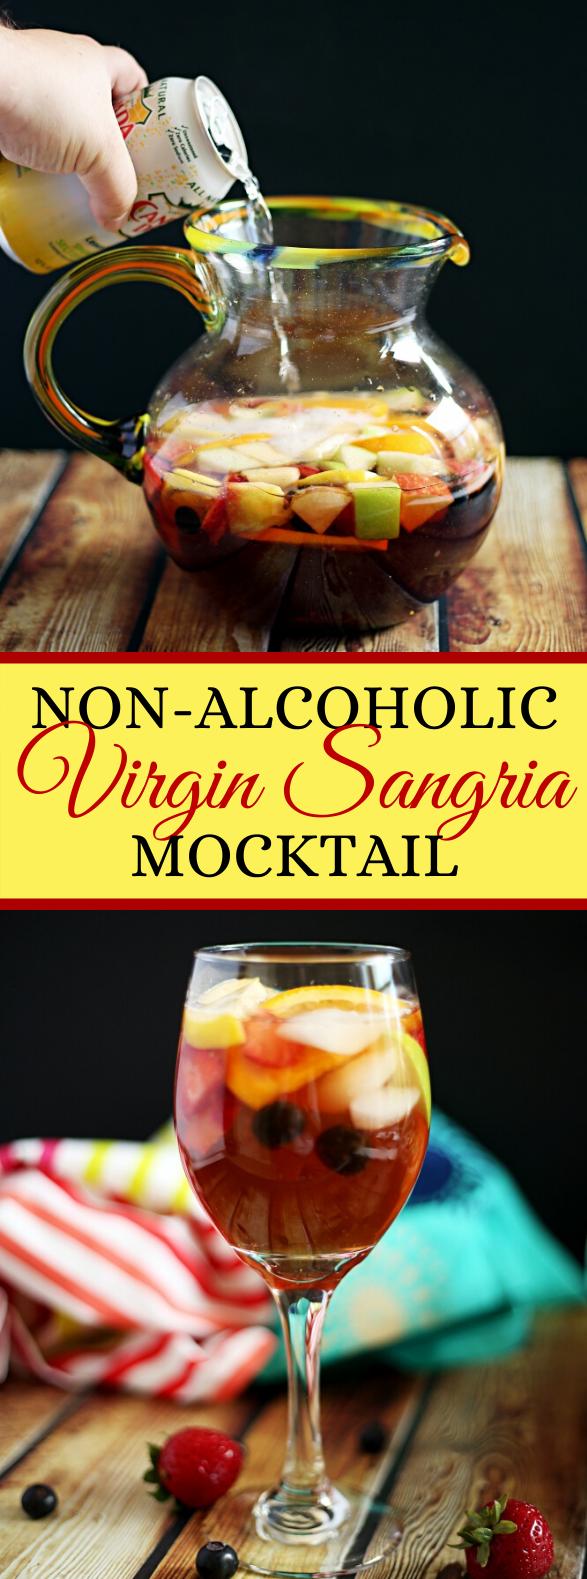 HOW TO MAKE A NON-ALCOHOLIC VIRGIN SANGRIA MOCKTAIL #drinks #favoritedrink